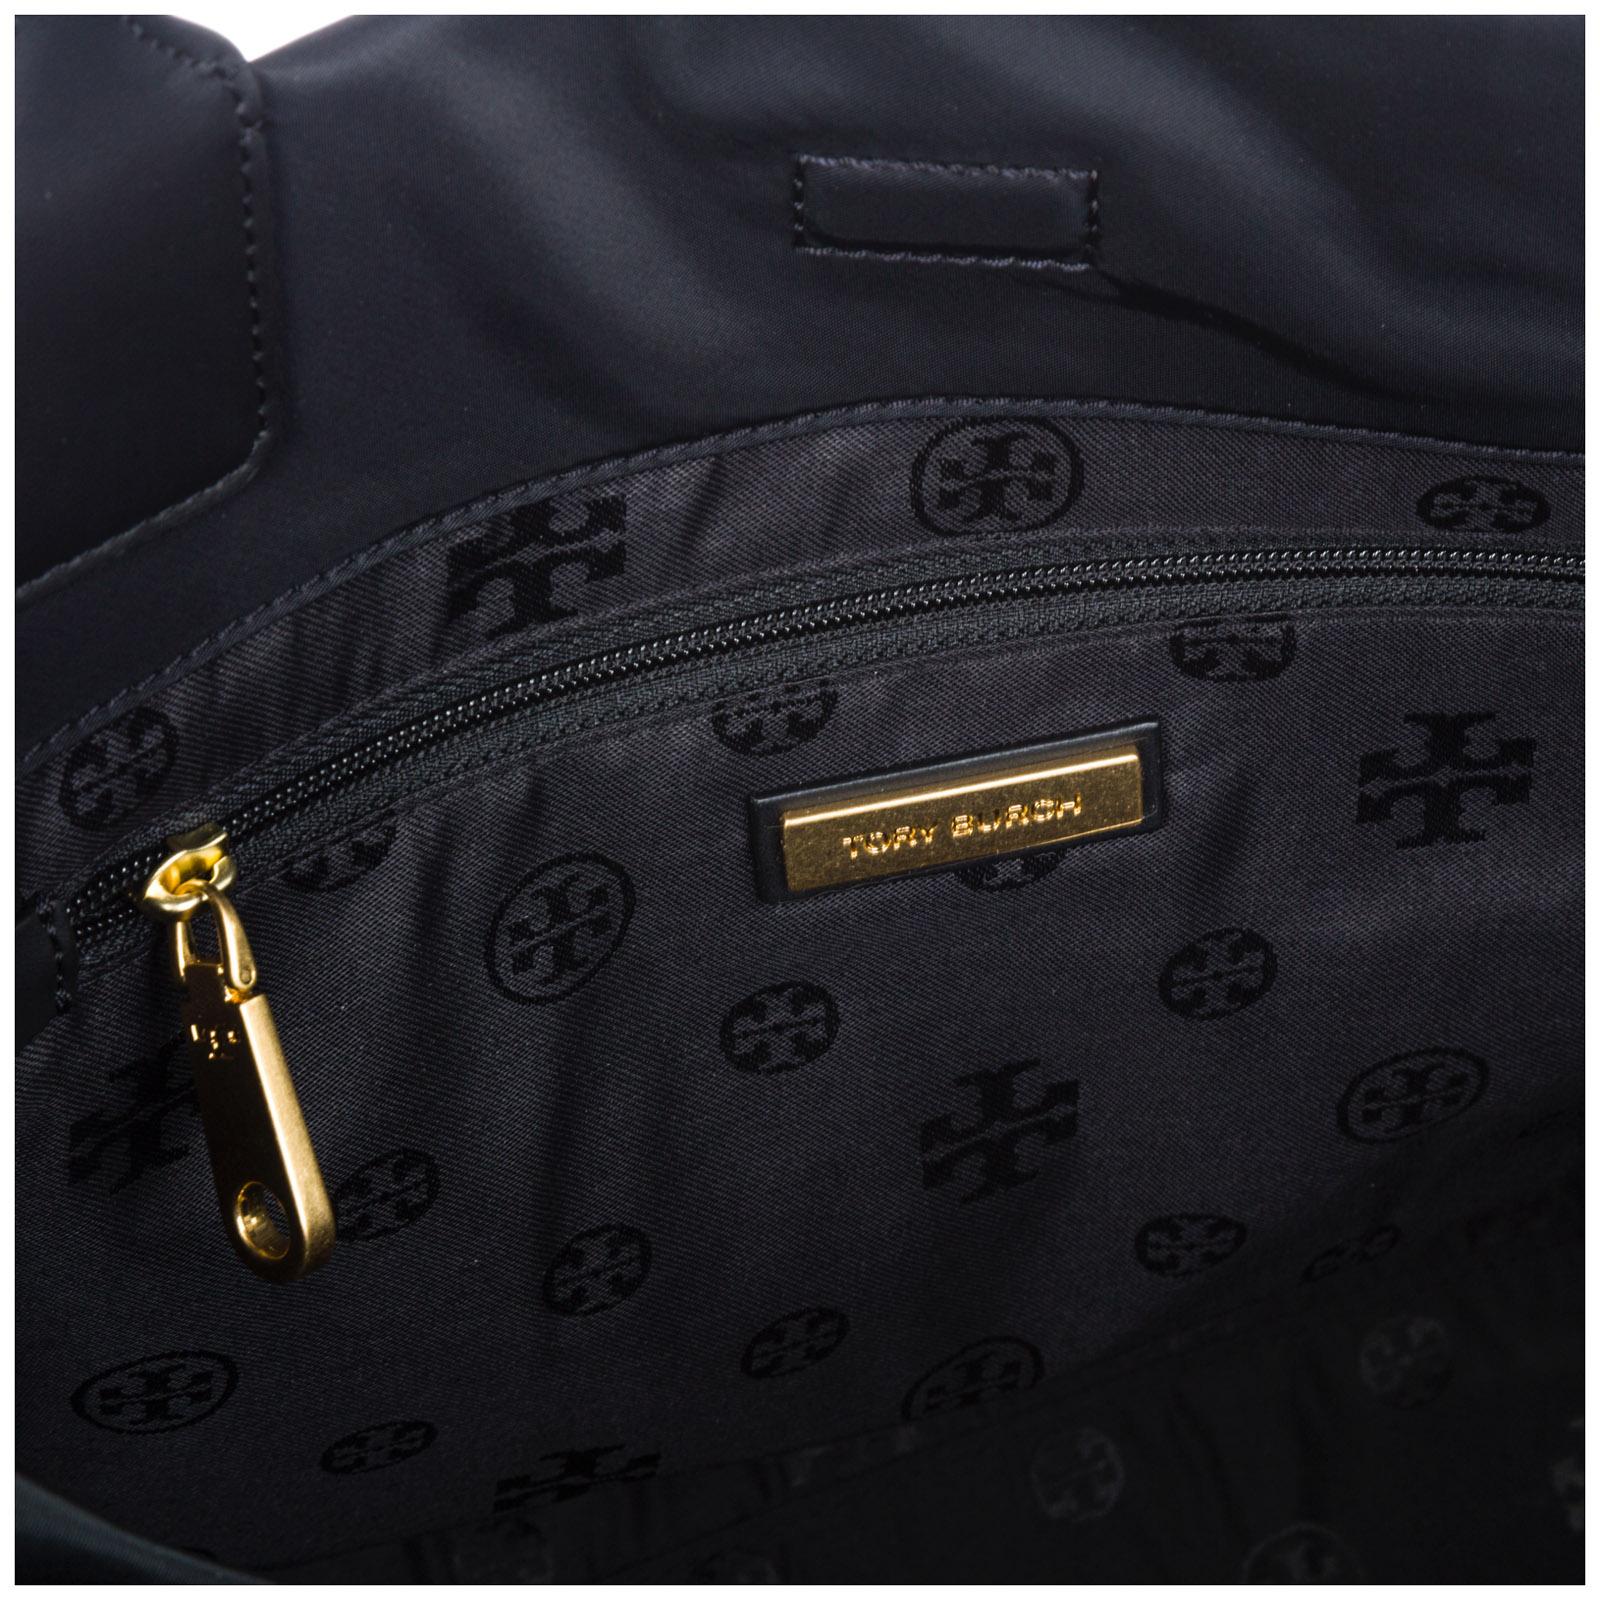 6e673c509c2 ... Women s handbag shopping bag purse tote ella